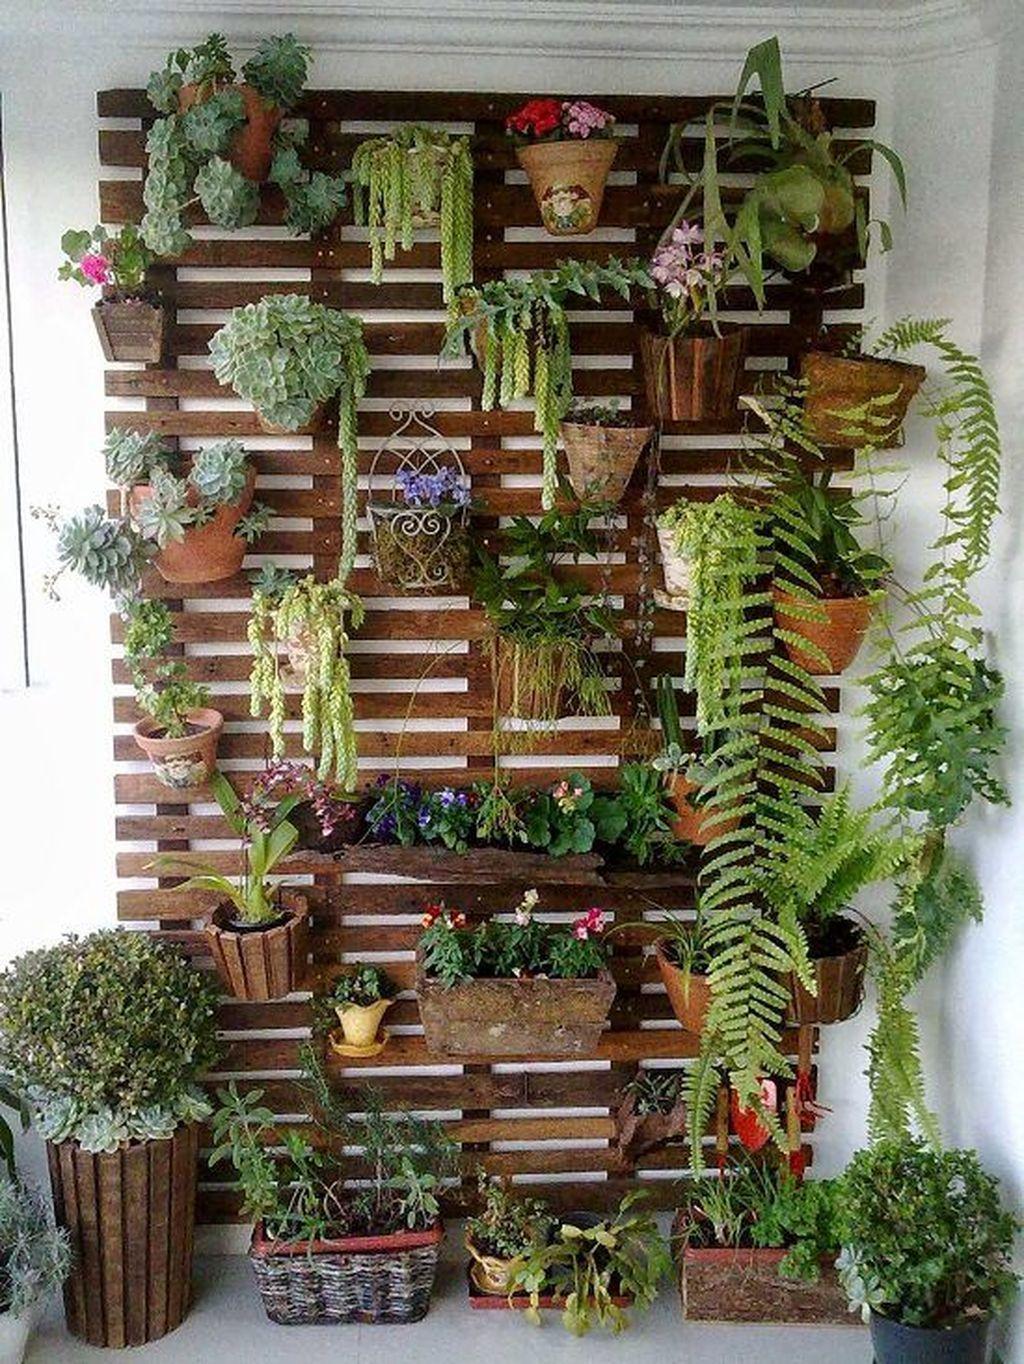 The Best Indoor Garden Ideas To Beautify Your Home 20